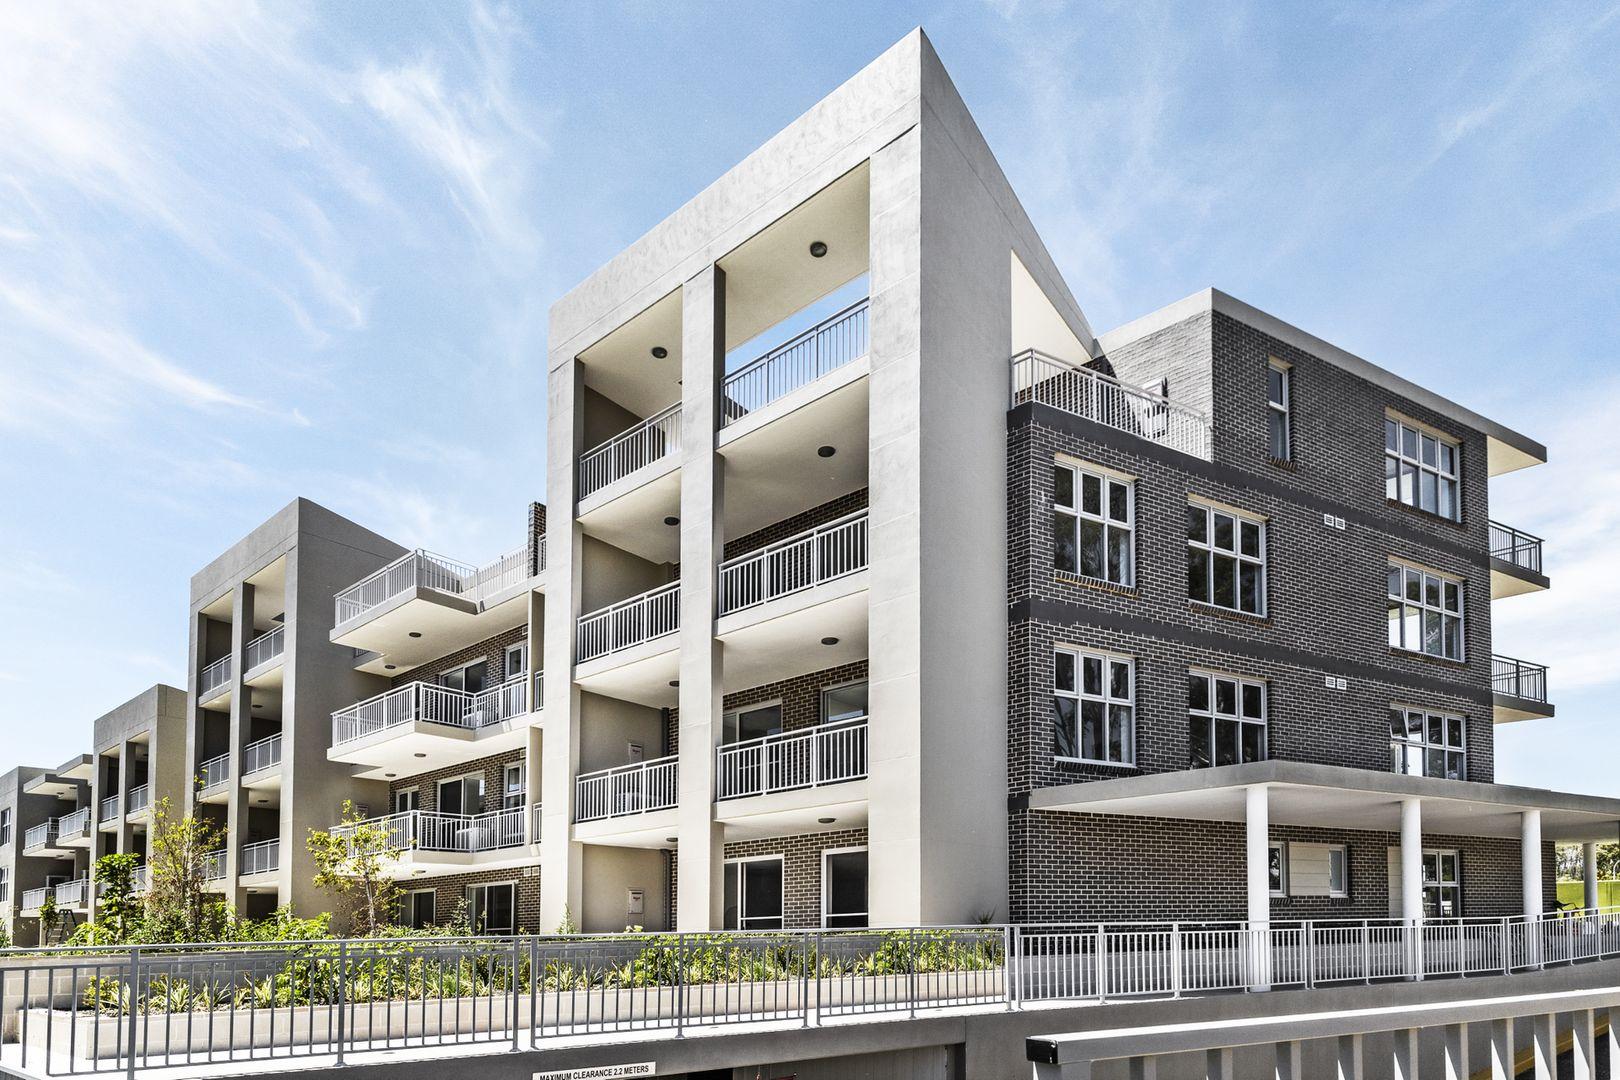 2 Bedrooms, Apartment, Leased, Regent Honey Eater Grove, 2 Bathrooms, Listing ID 1433, North Kellyville , NSW, Australia, 2155,